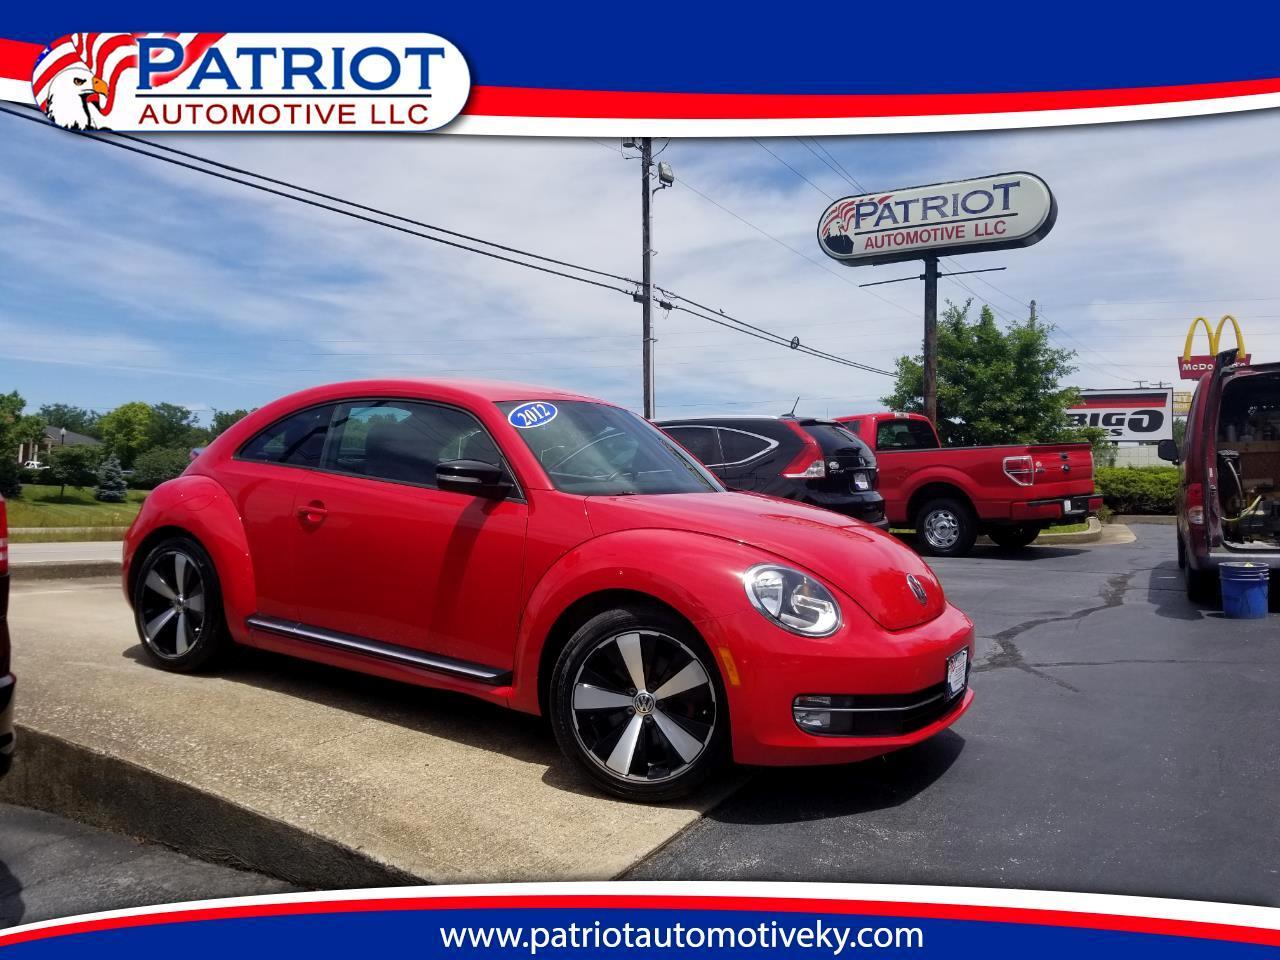 2012 Volkswagen Beetle 2dr Cpe DSG 2.0T Turbo w/Sound/Nav PZEV